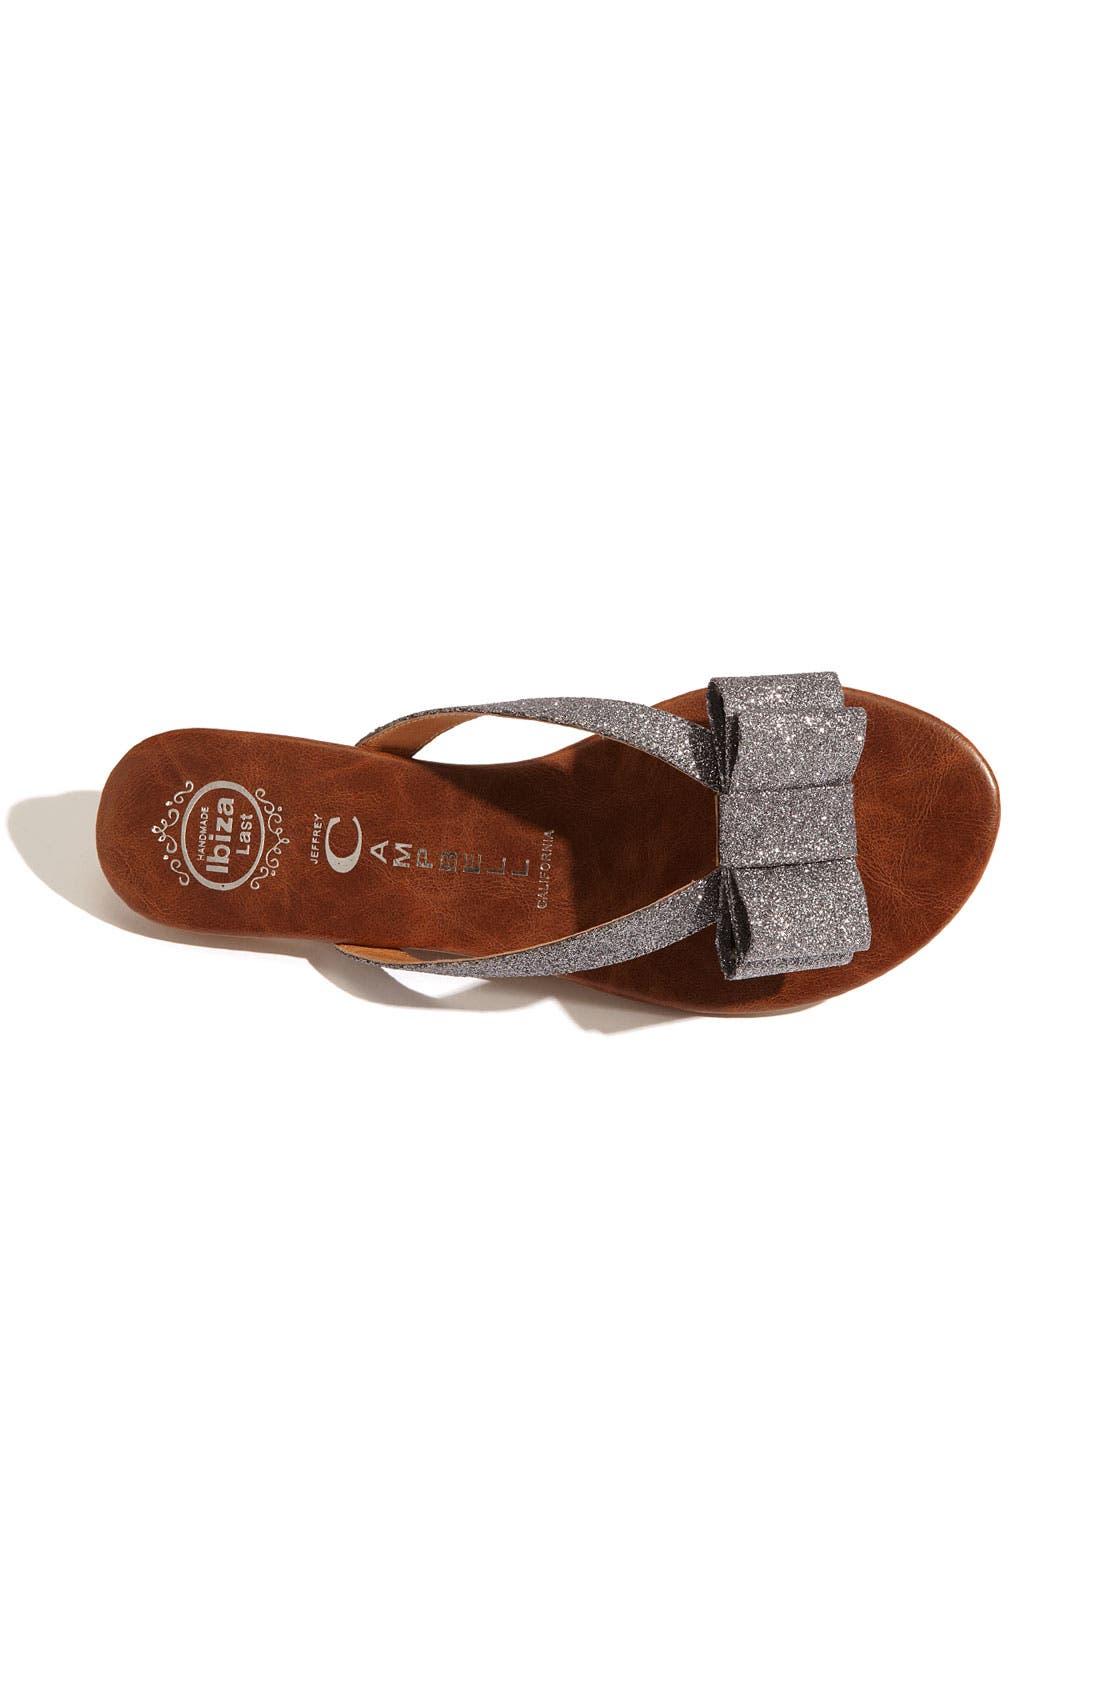 Alternate Image 3  - Jeffrey Campbell 'Esmerald' Glitter Sandal